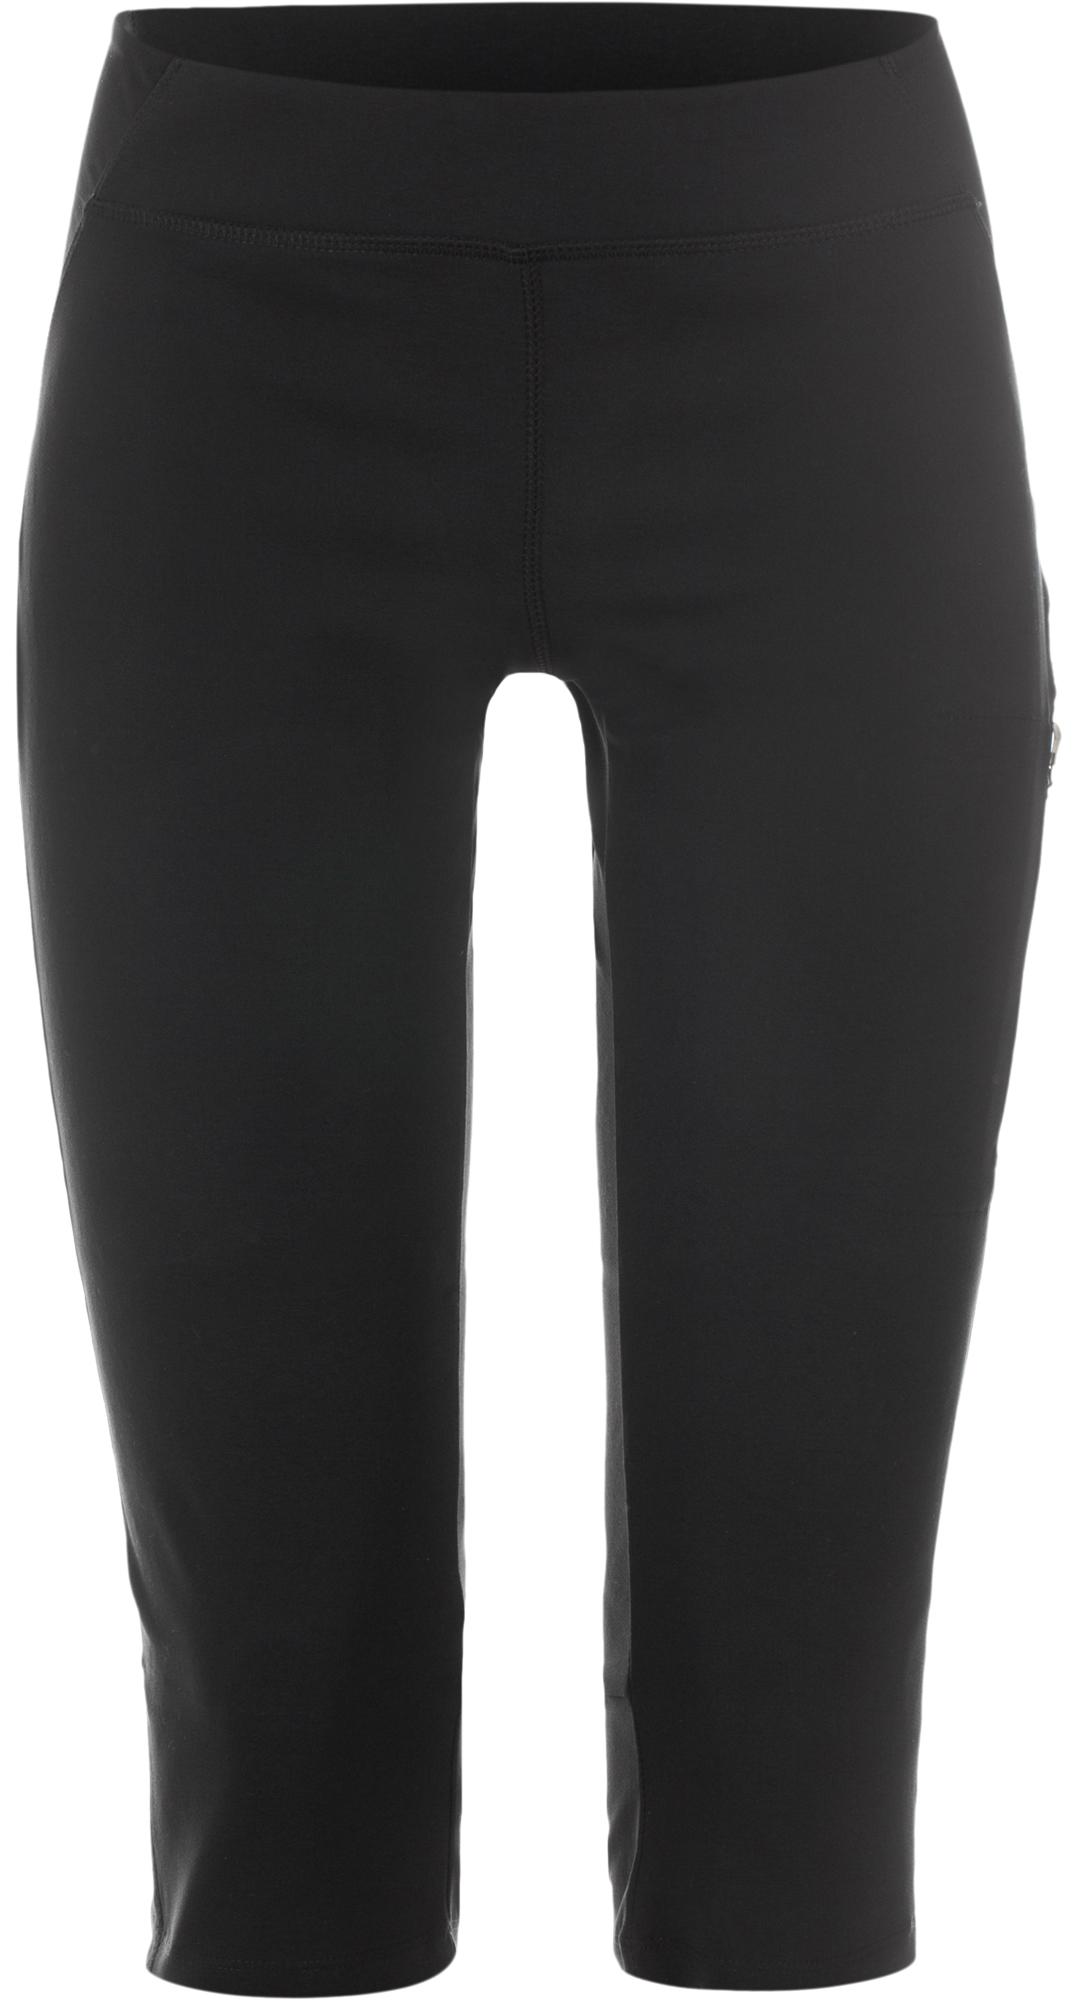 Columbia Брюки женские Columbia Back Beauty прямые широкие женские зимние брюки